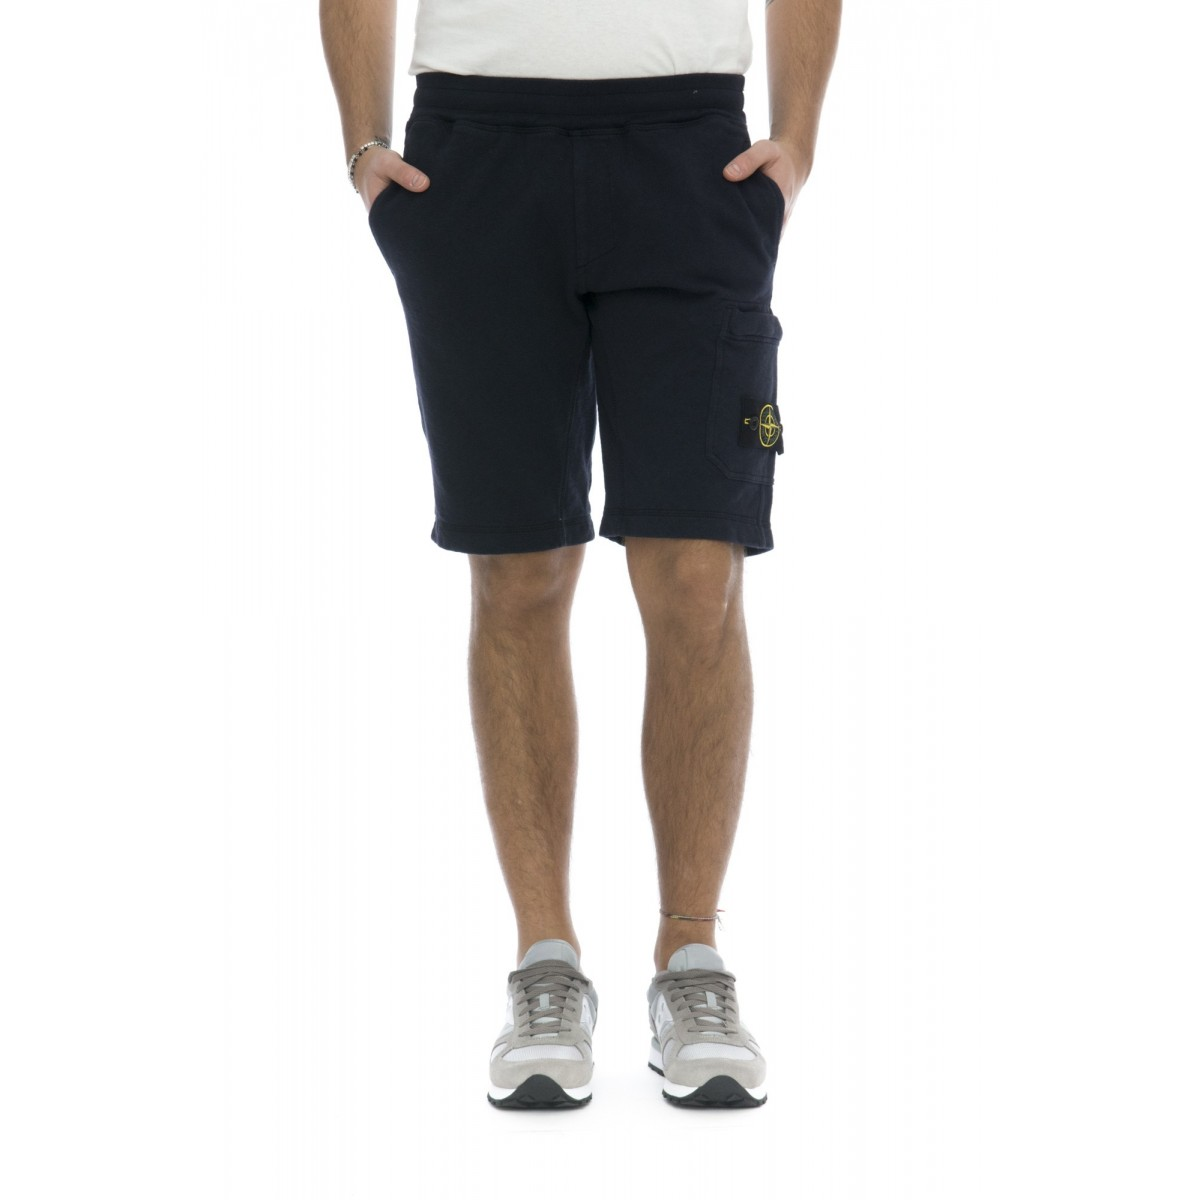 Bermuda - 66360 bermuda jogging felpa